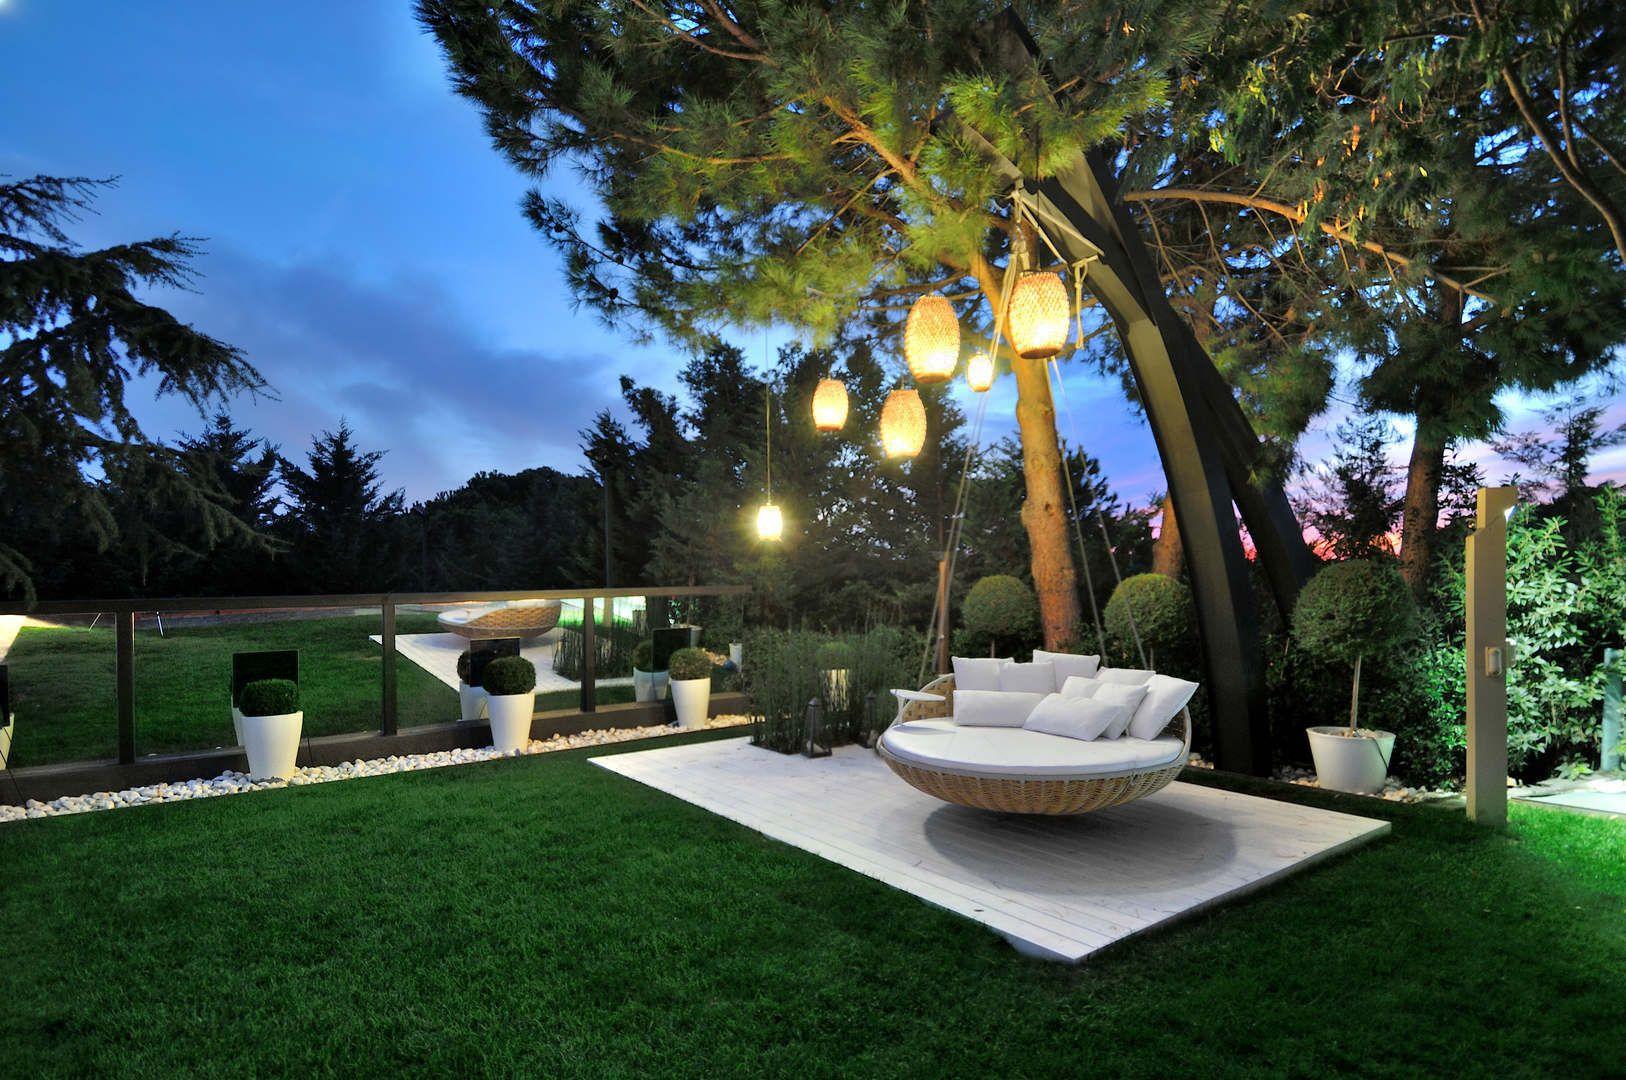 REACO-COSITAS Jardin, Terraza & Balcon! [recopilación]